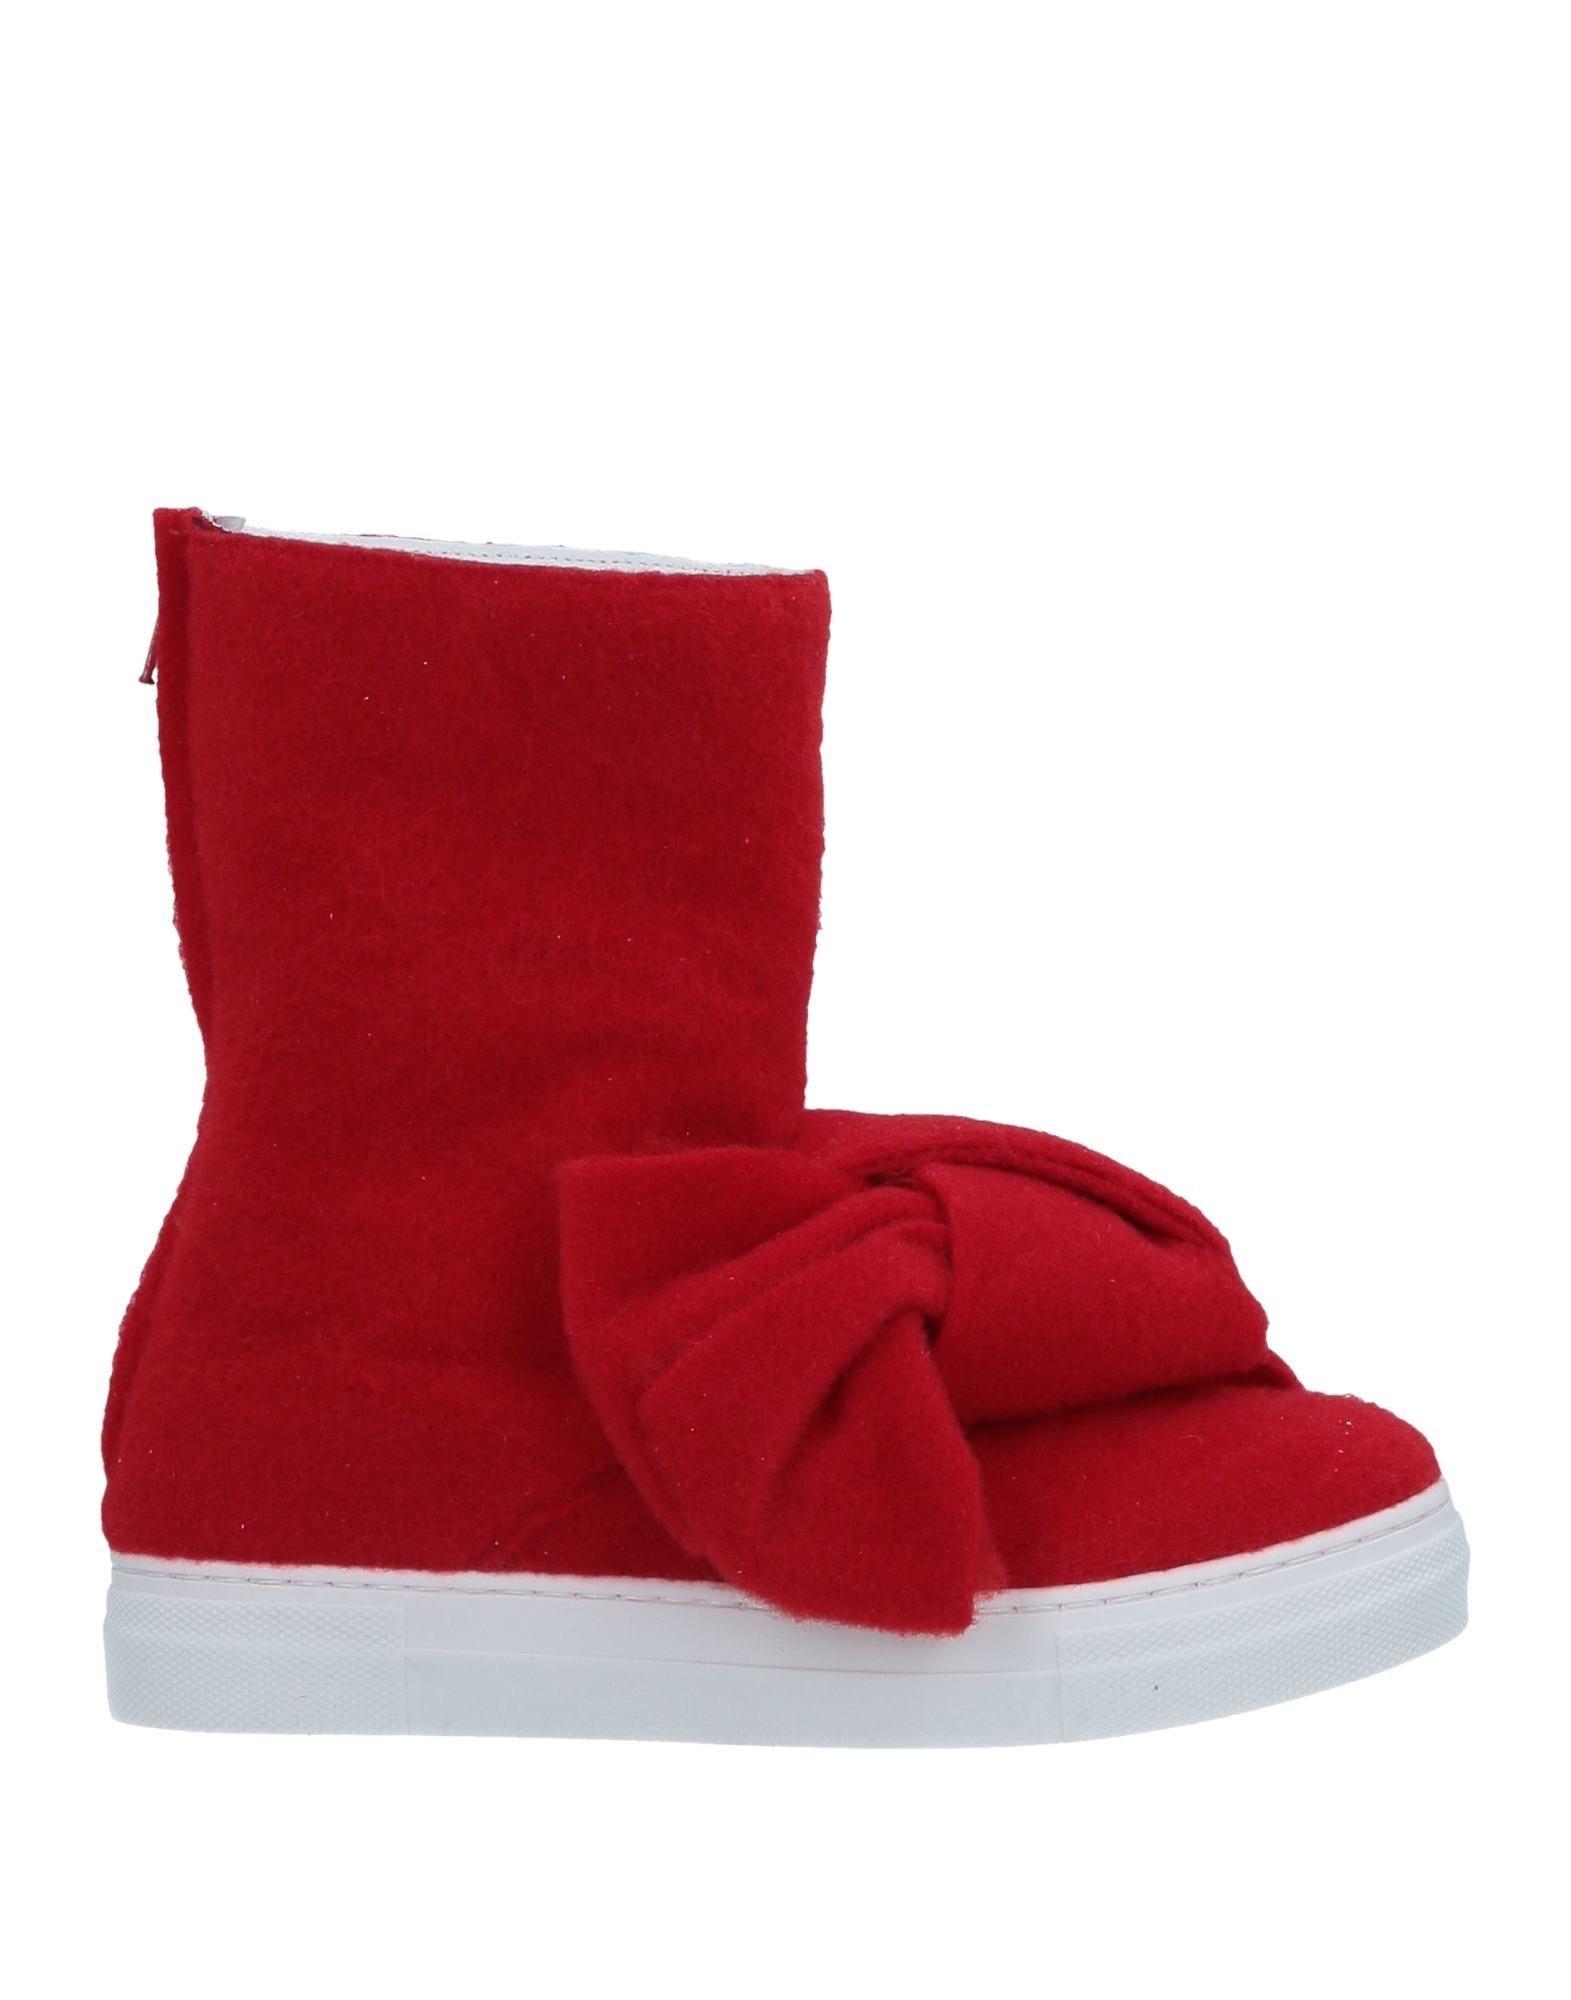 JOSHUA*S Полусапоги и высокие ботинки ботинки s tep ботинки